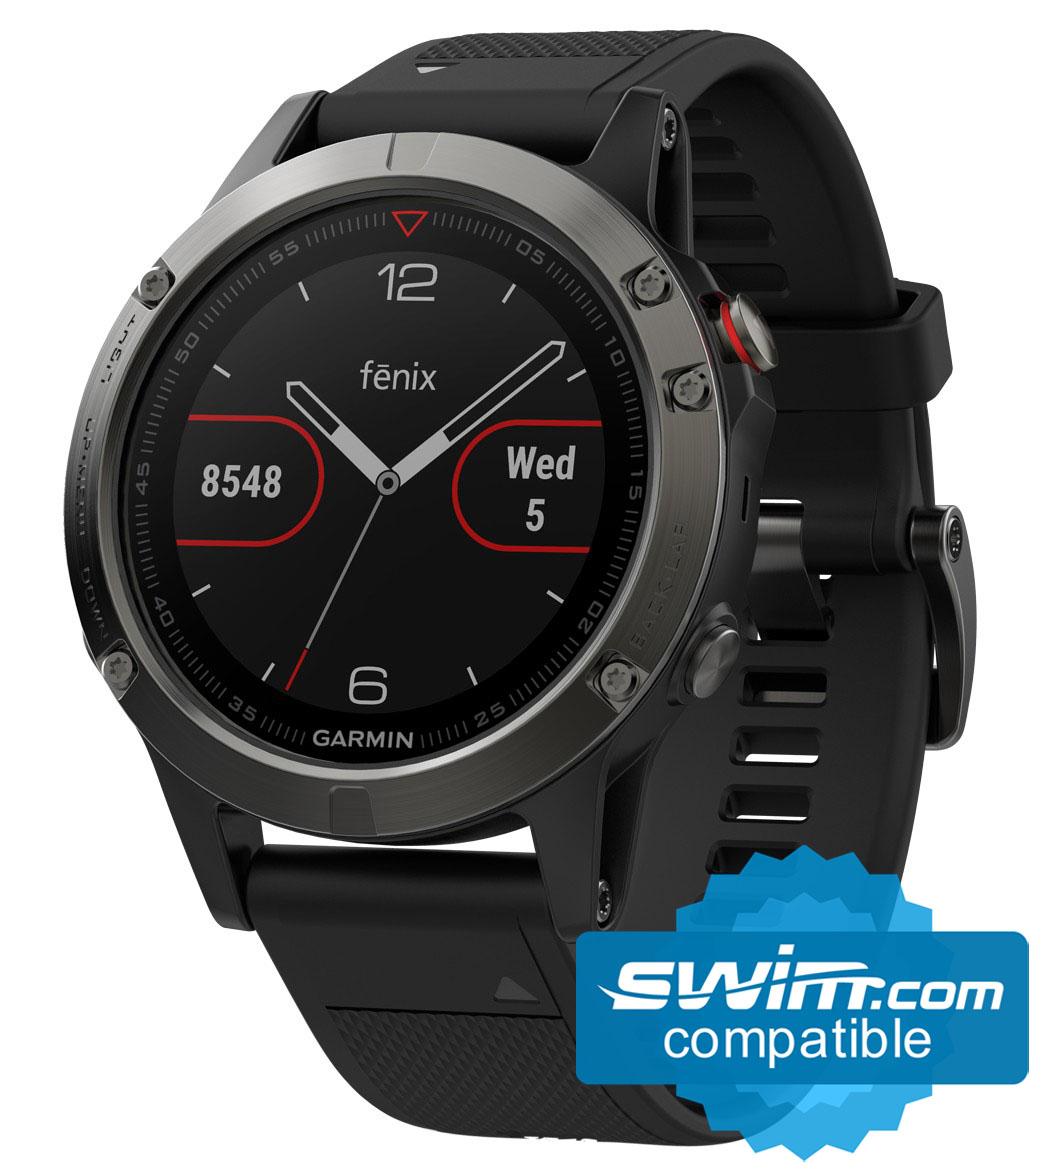 18b80afbe969 Garmin fenix 5 Multi-Sport GPS Watch at SwimOutlet.com - Free Shipping